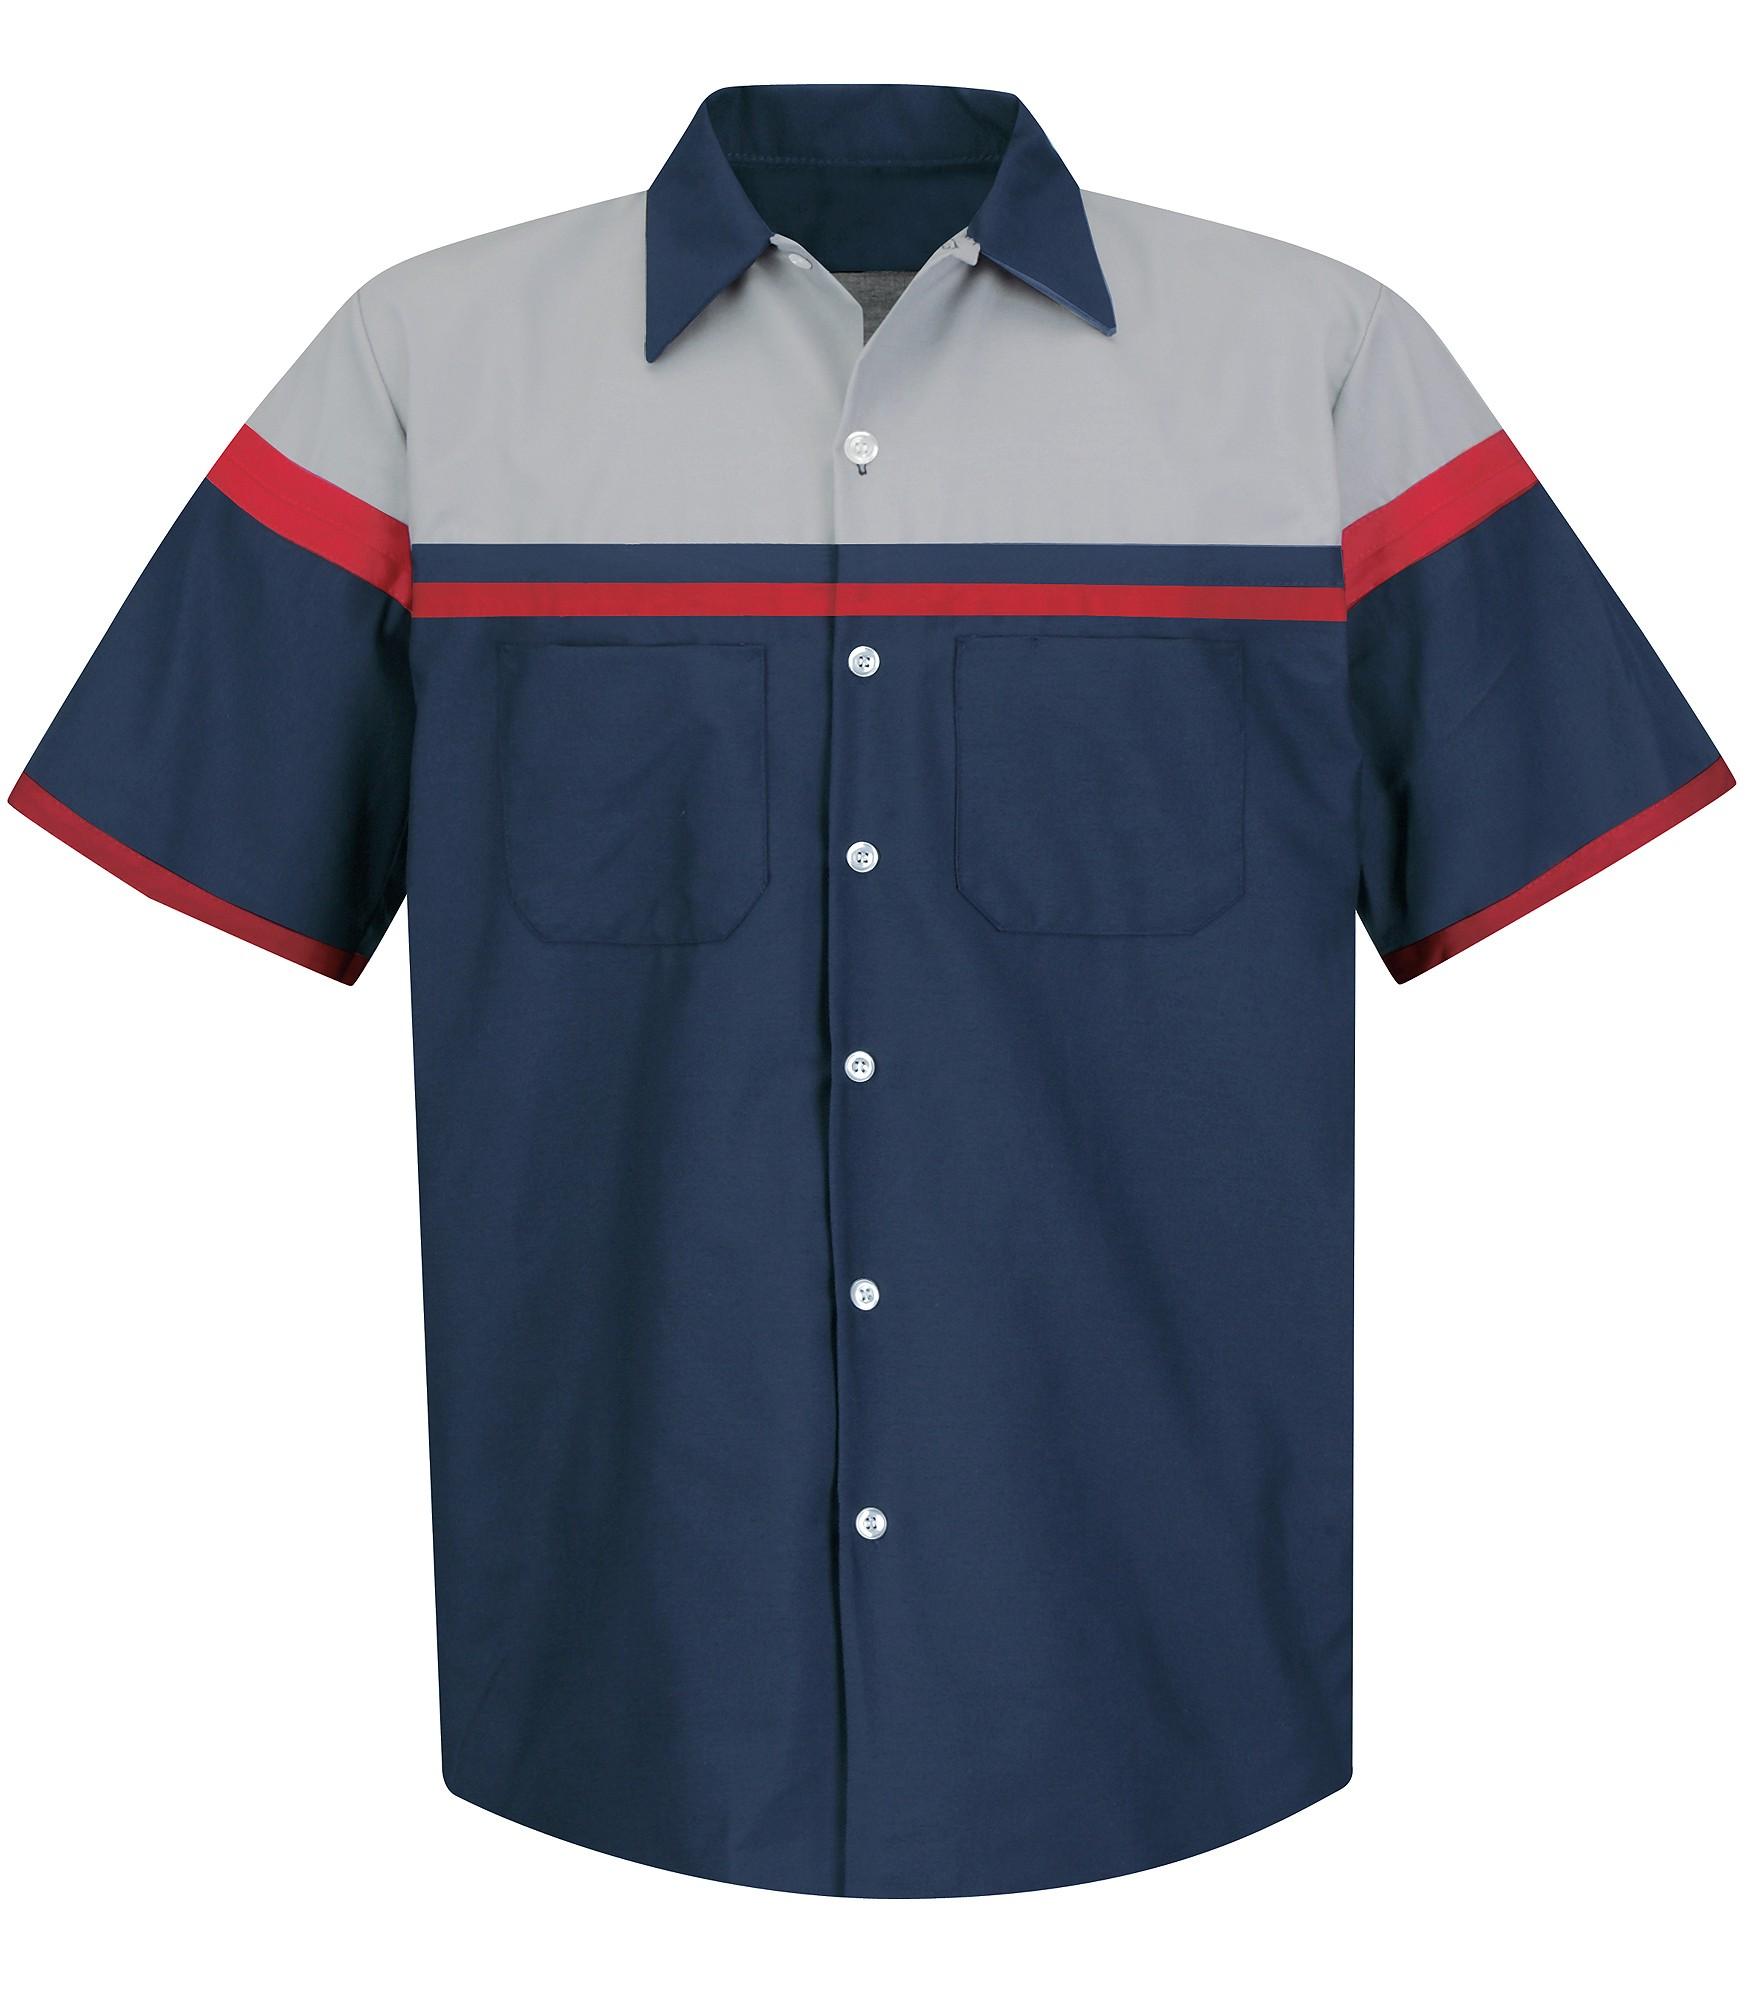 Amp us red kap short sleeve performance technician shirt for Red kap motorsports shirt